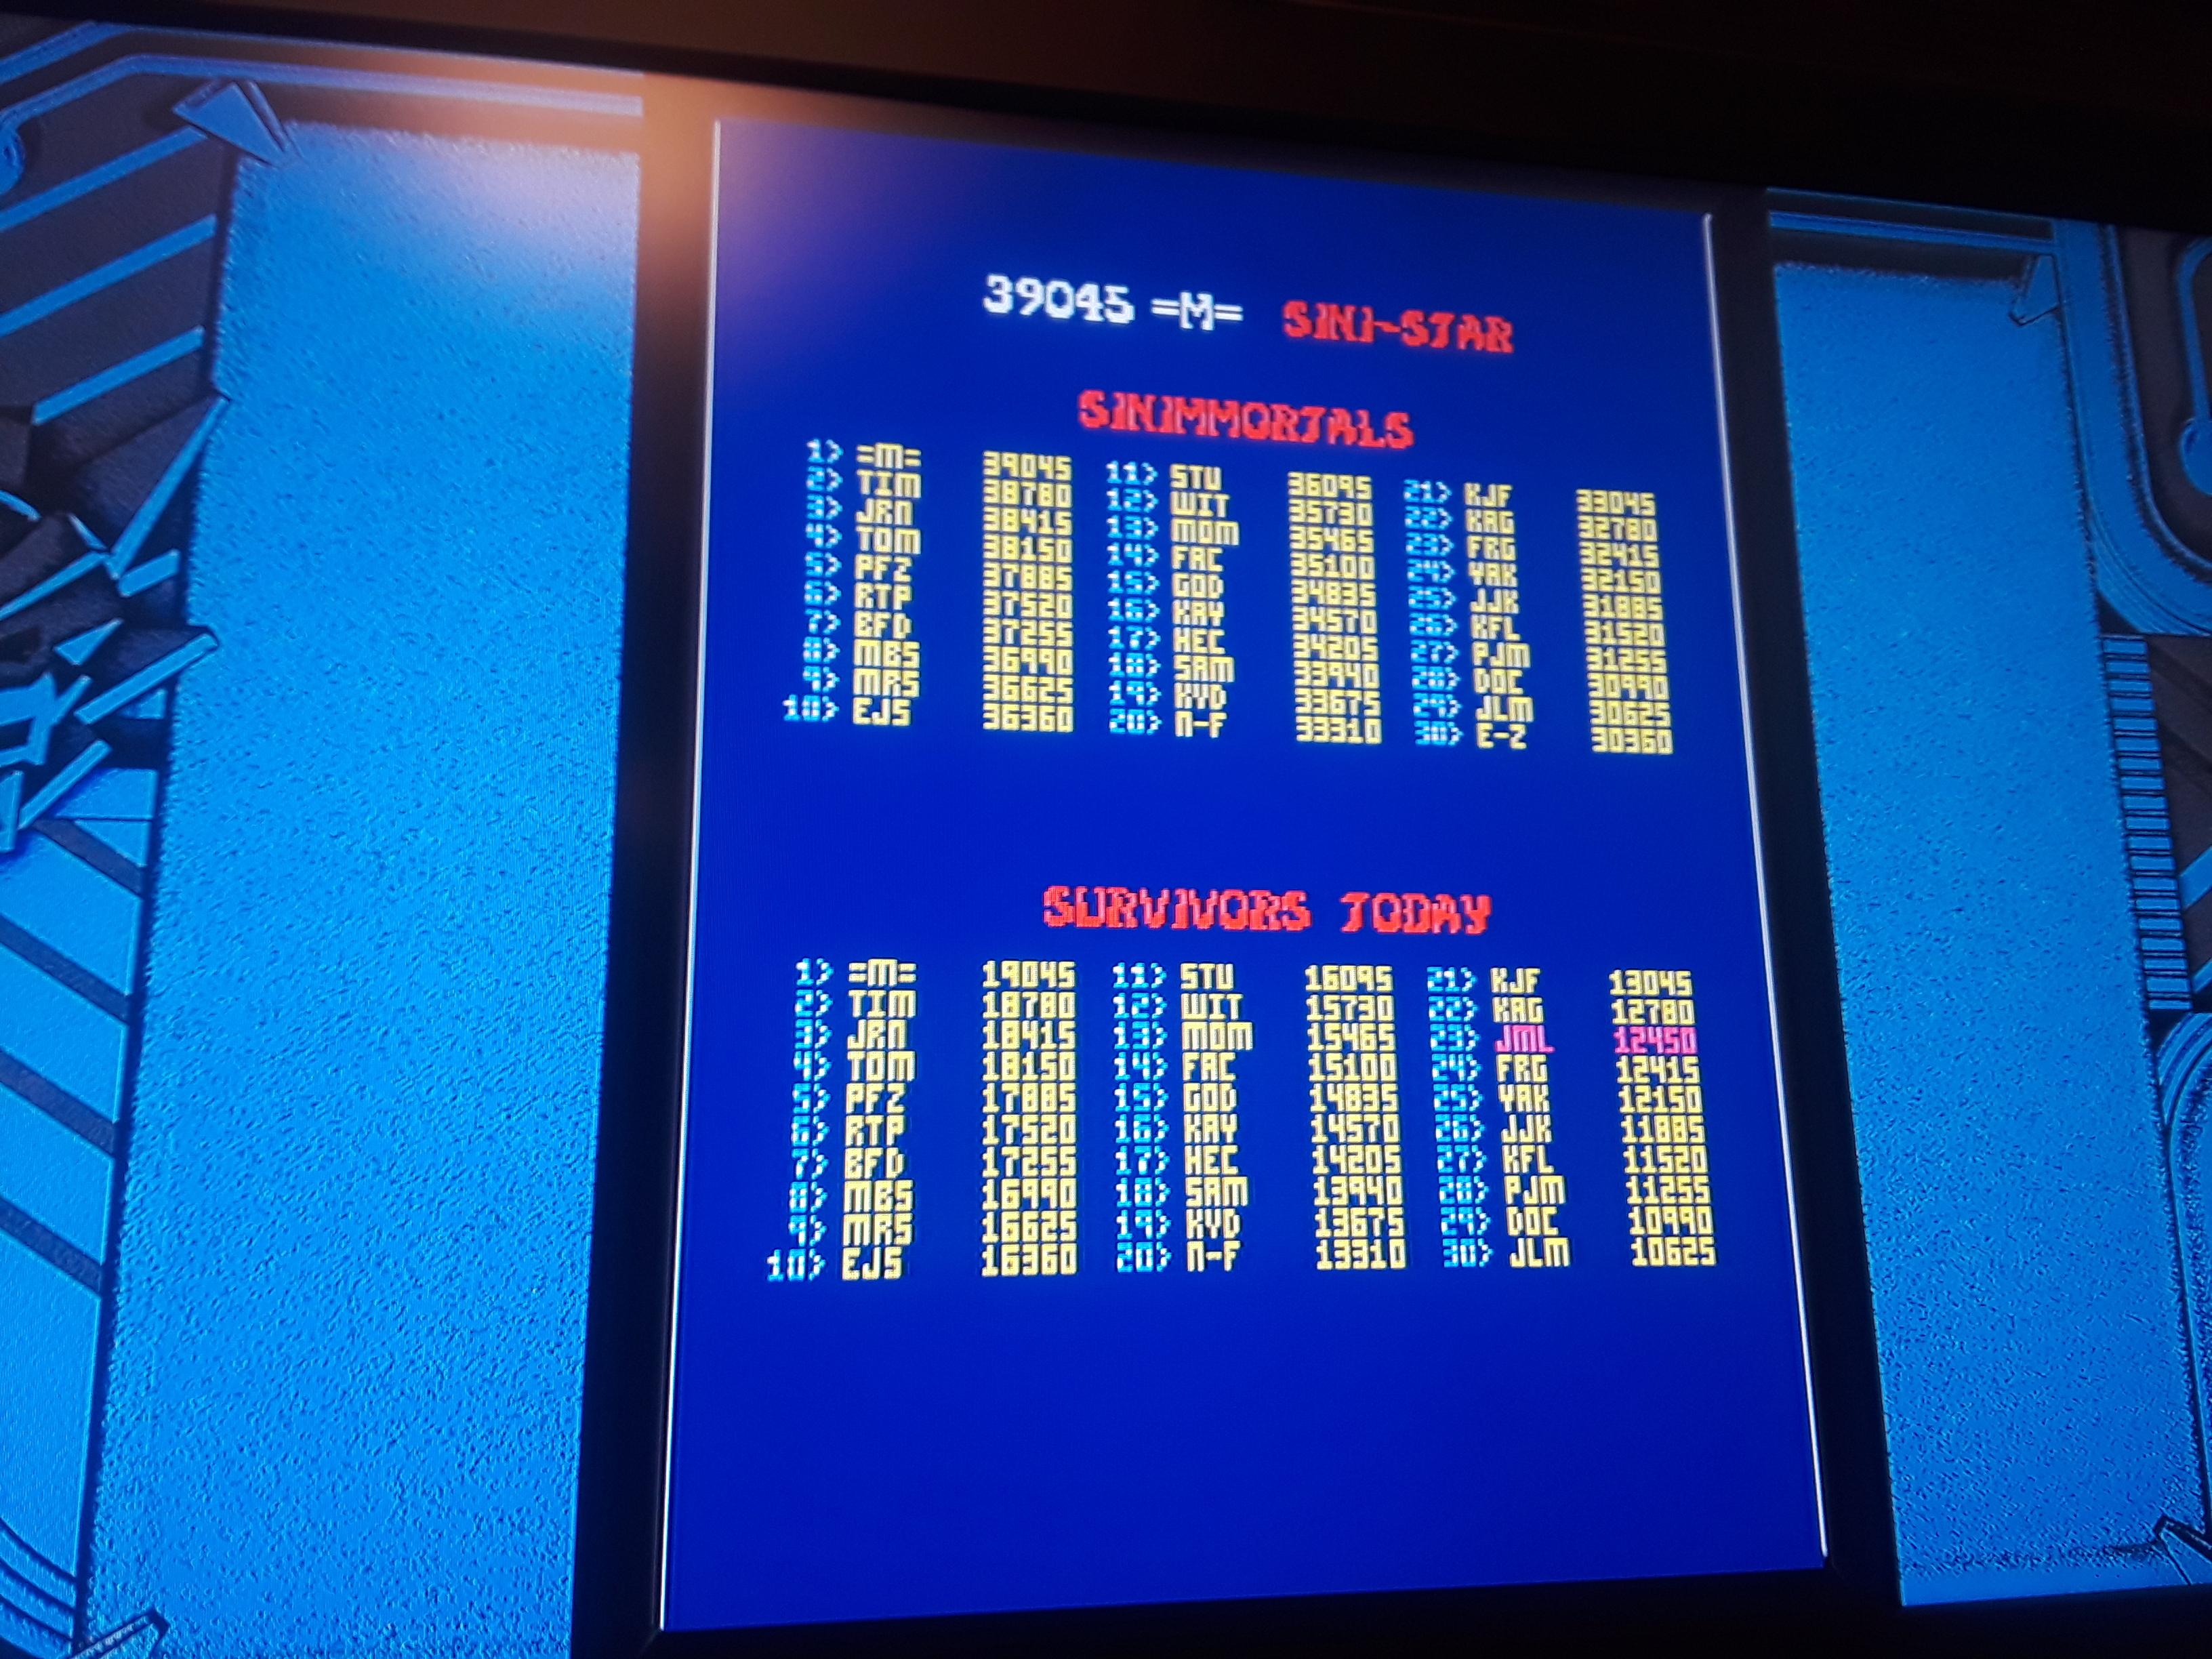 JML101582: Midway Arcade Origins: Sinistar (Playstation 3) 12,450 points on 2018-10-04 21:08:36